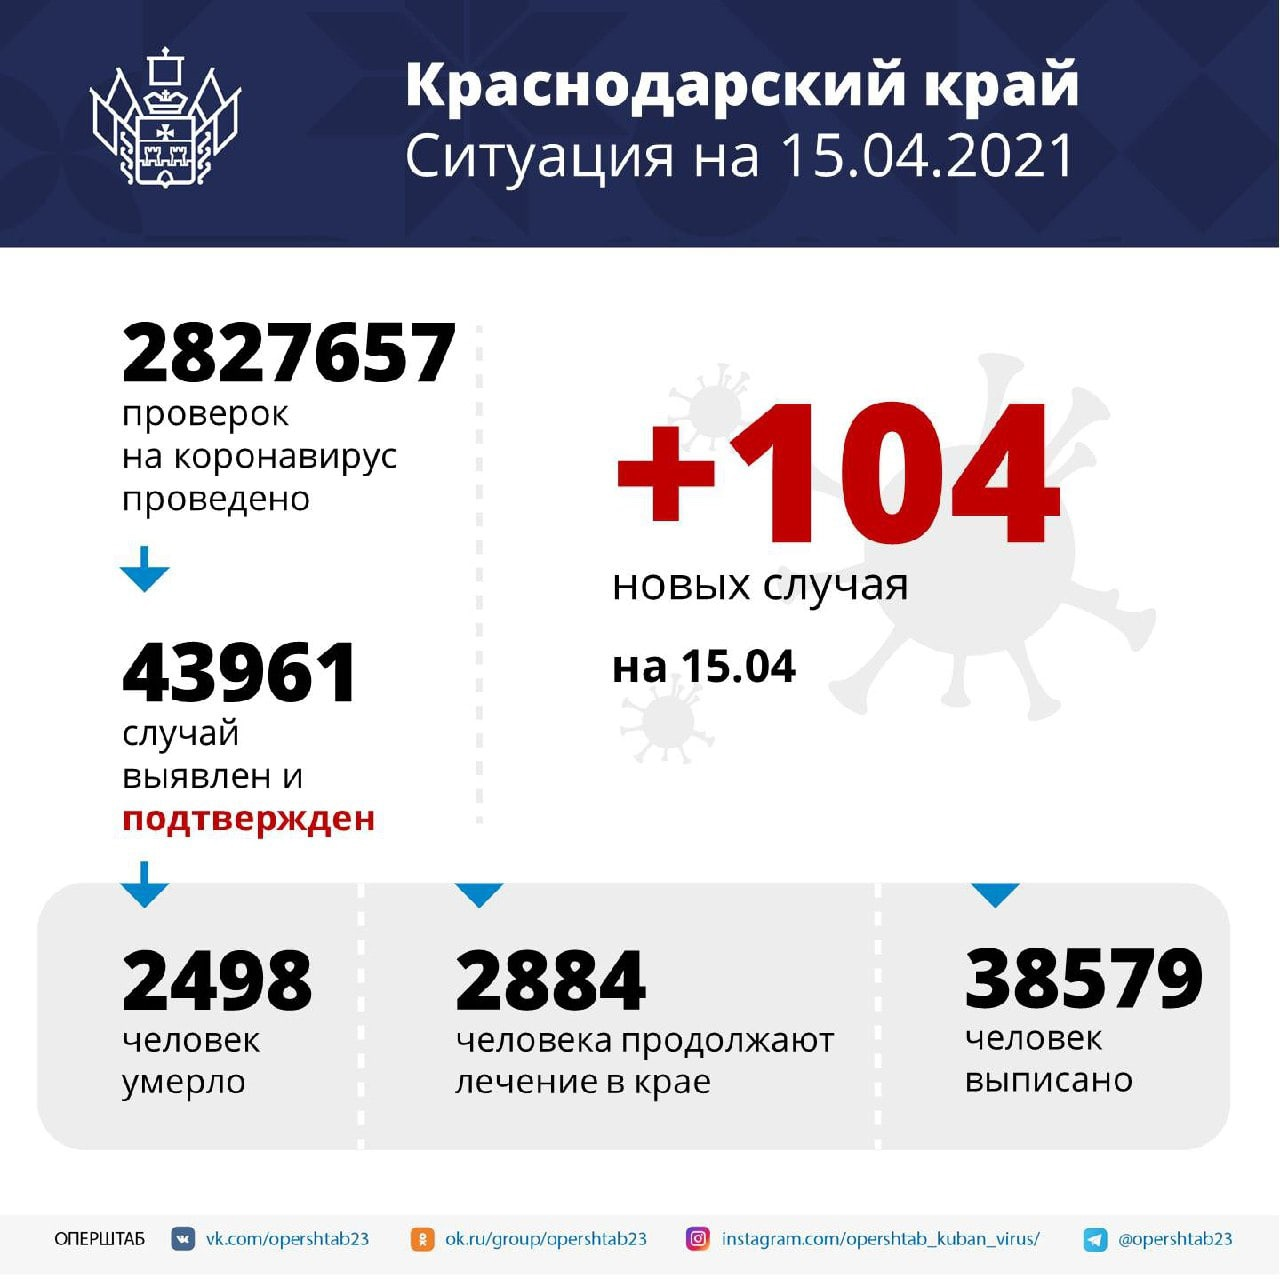 За сутки в регионе зарегистрировали 104 заболевших COVID-19⠀В...